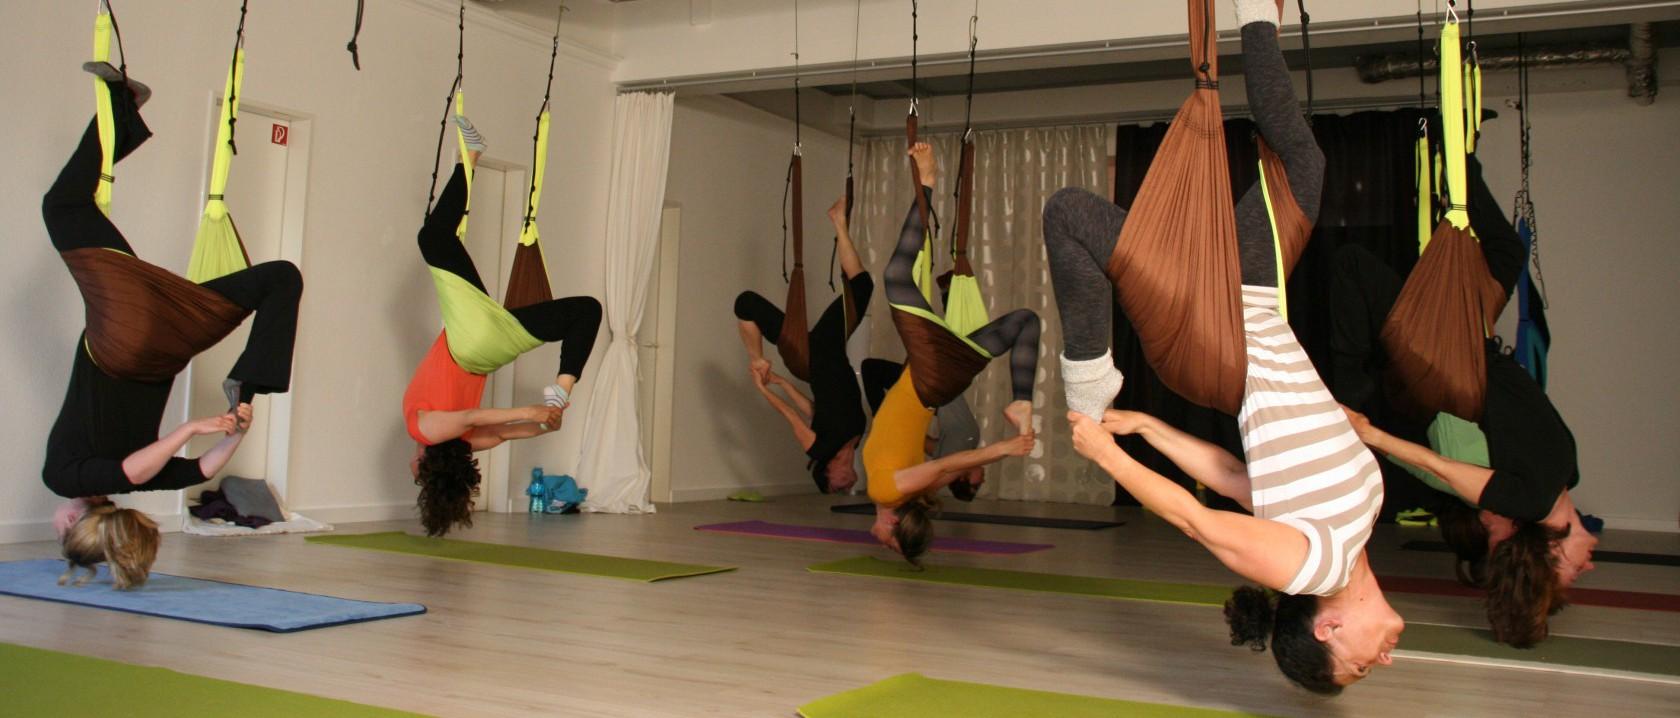 Erlebe Yoga - Erlebe Dich